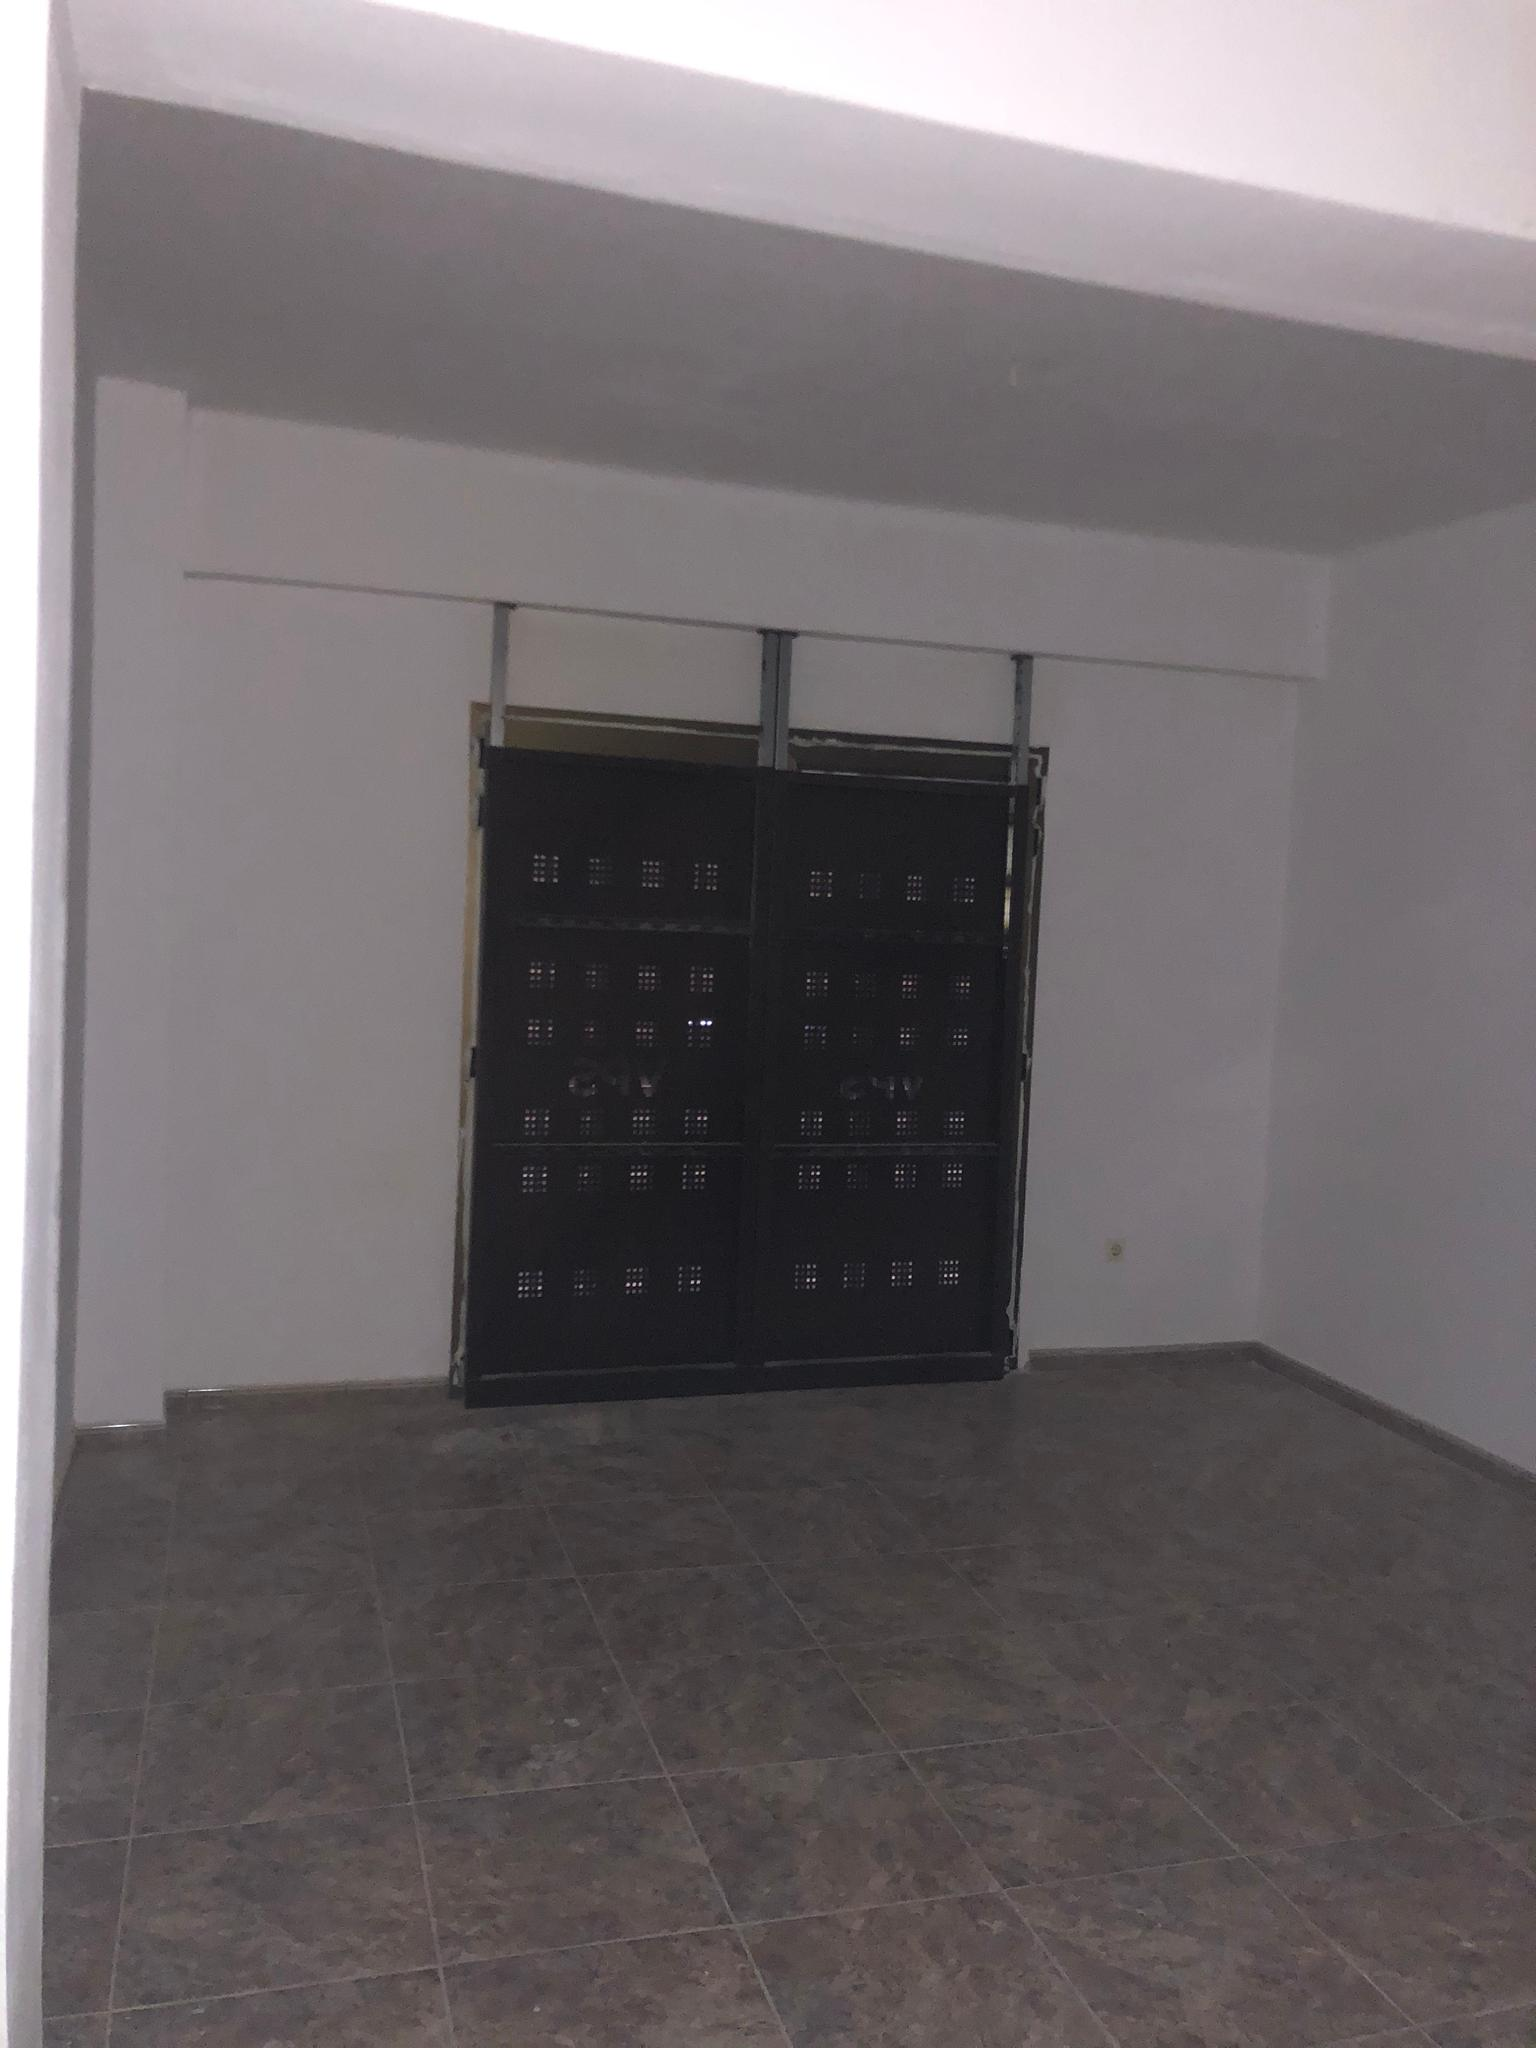 Alquiler Piso  C/ mariano viada. Solvia inmobiliaria - piso palma de mallorca